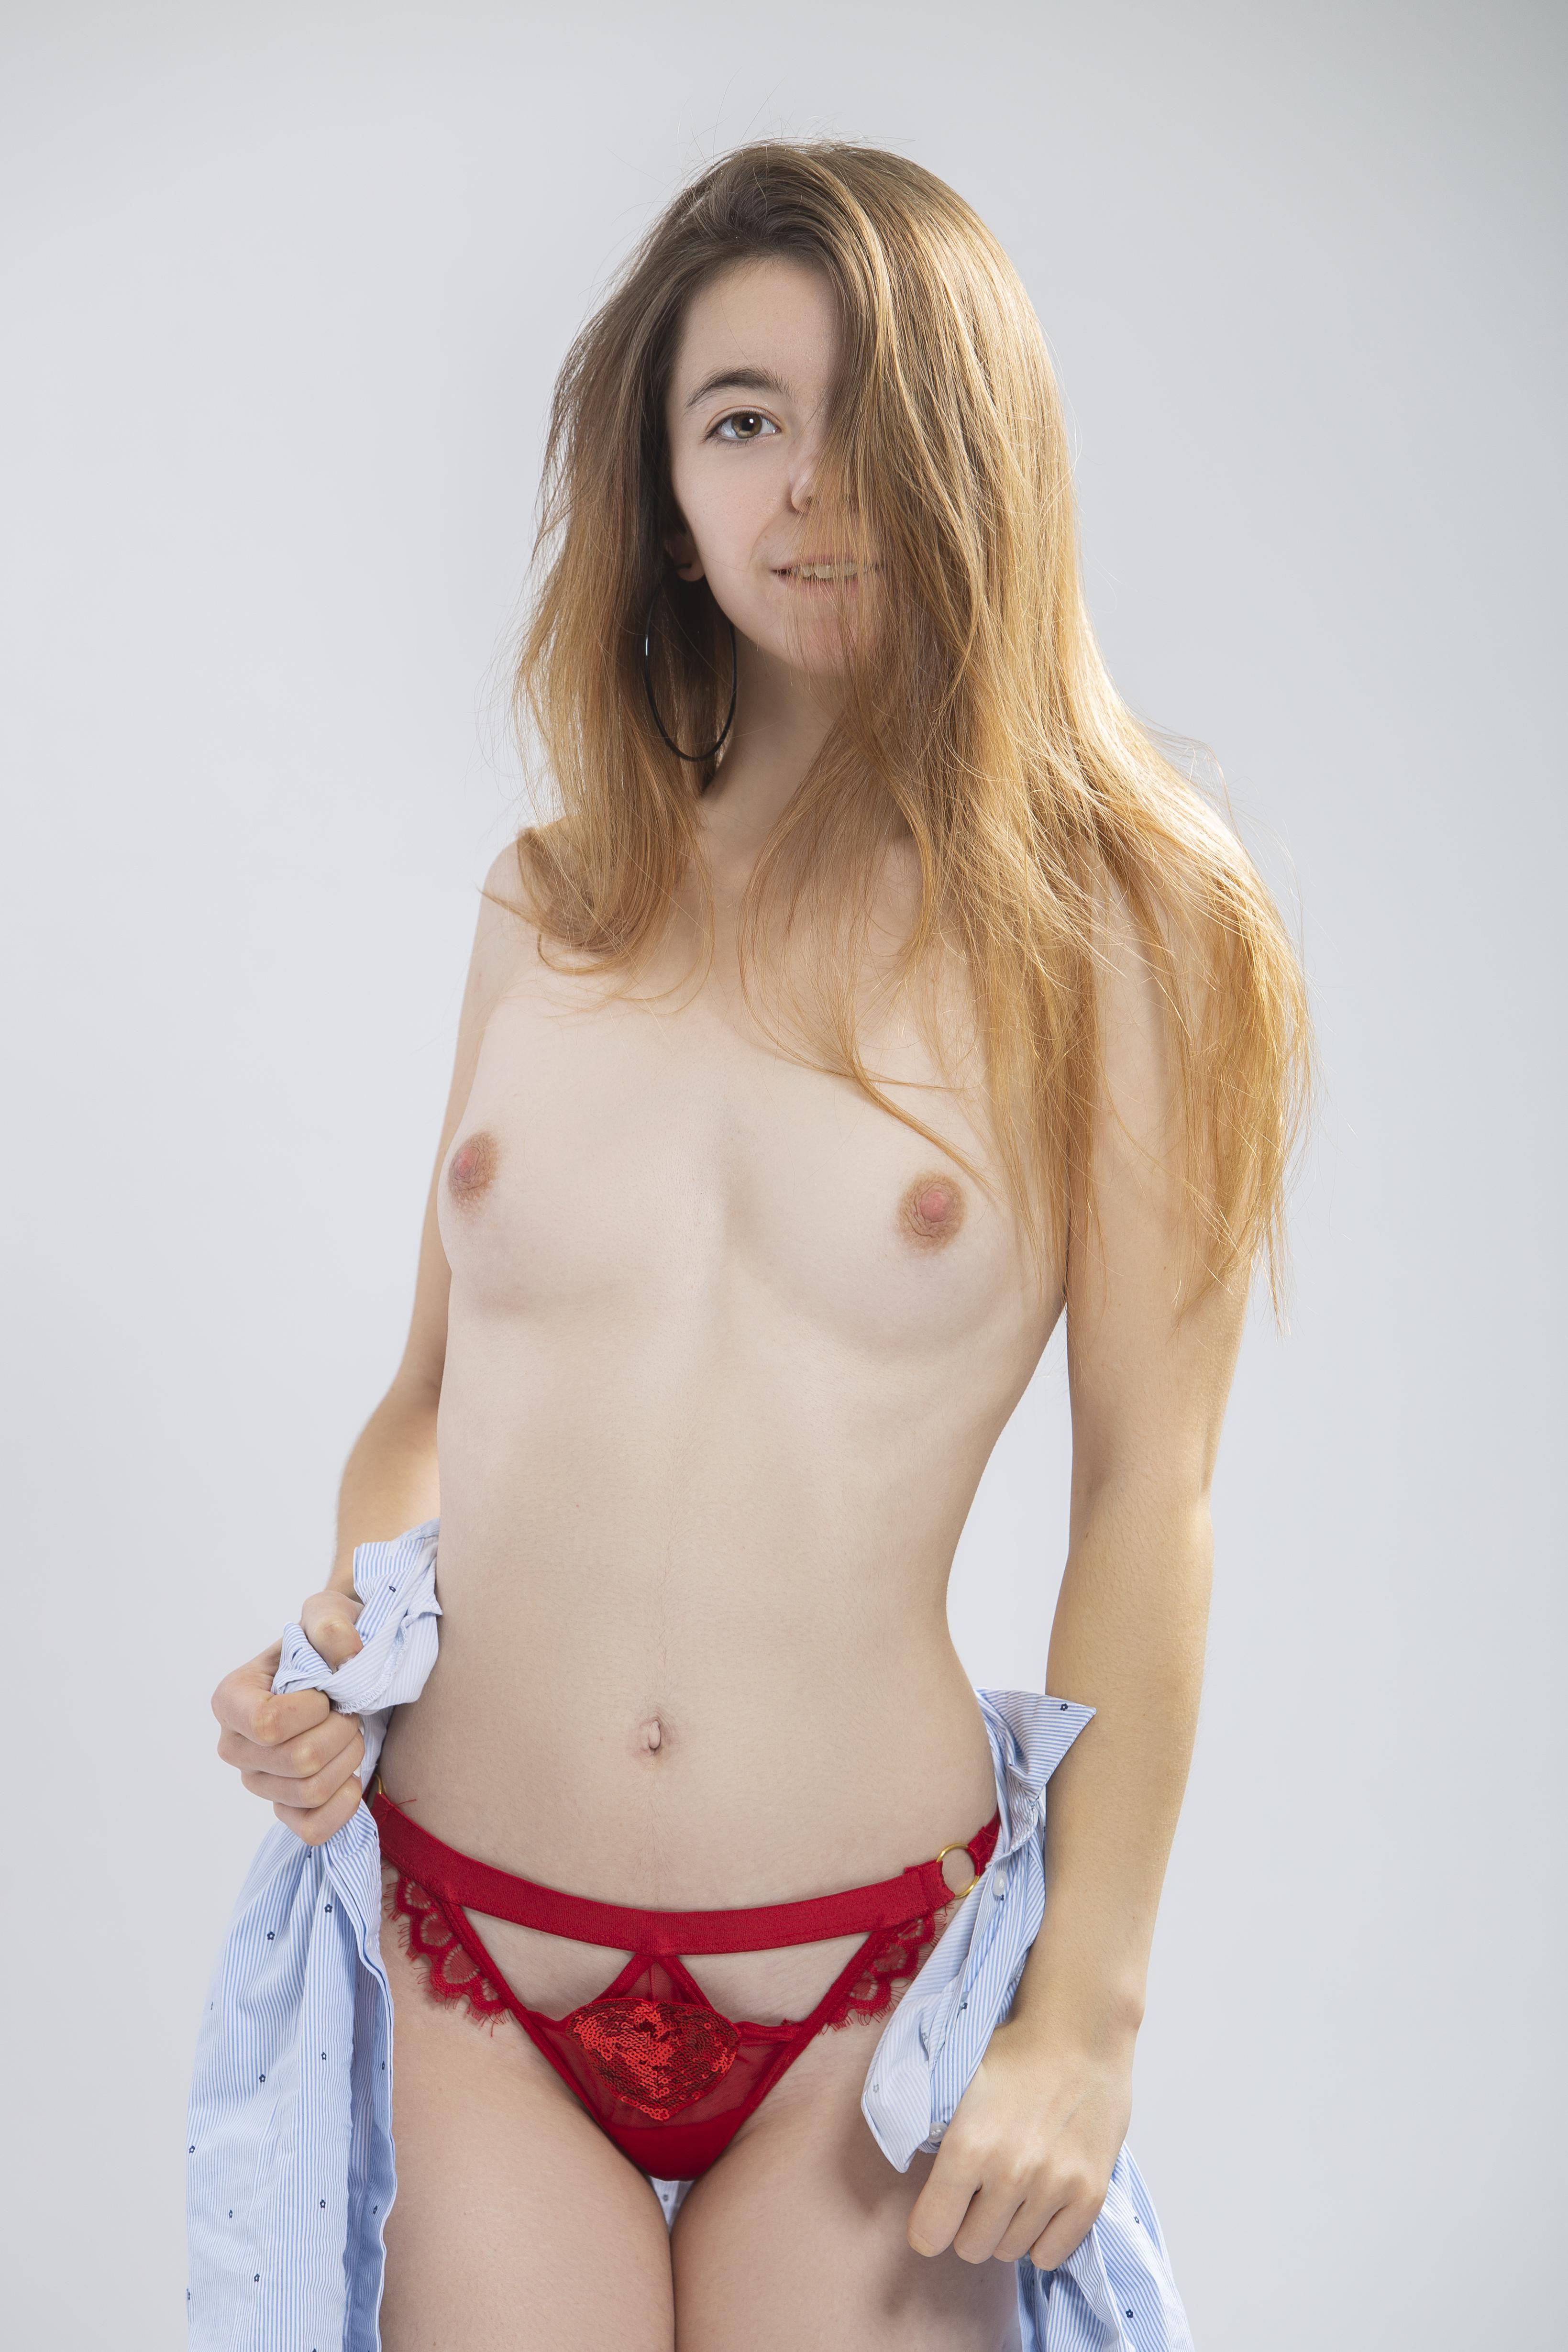 Lina Roselina by Sanoto Peter